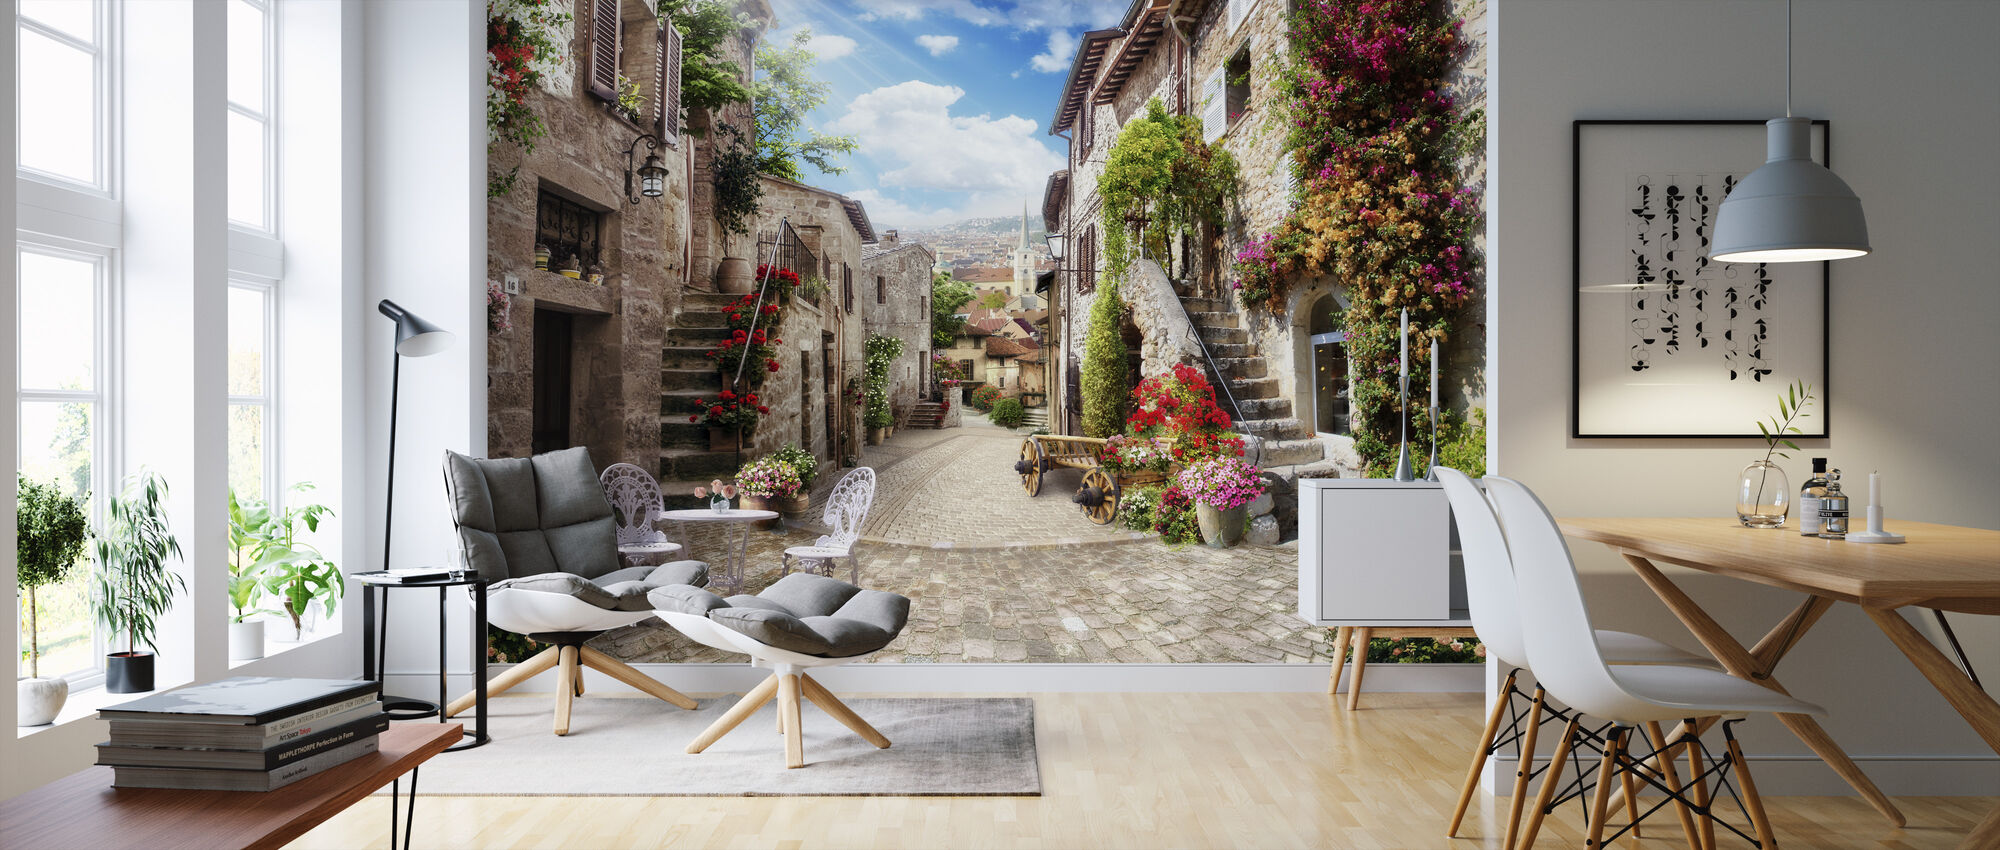 Romantic Alley - Wallpaper - Living Room